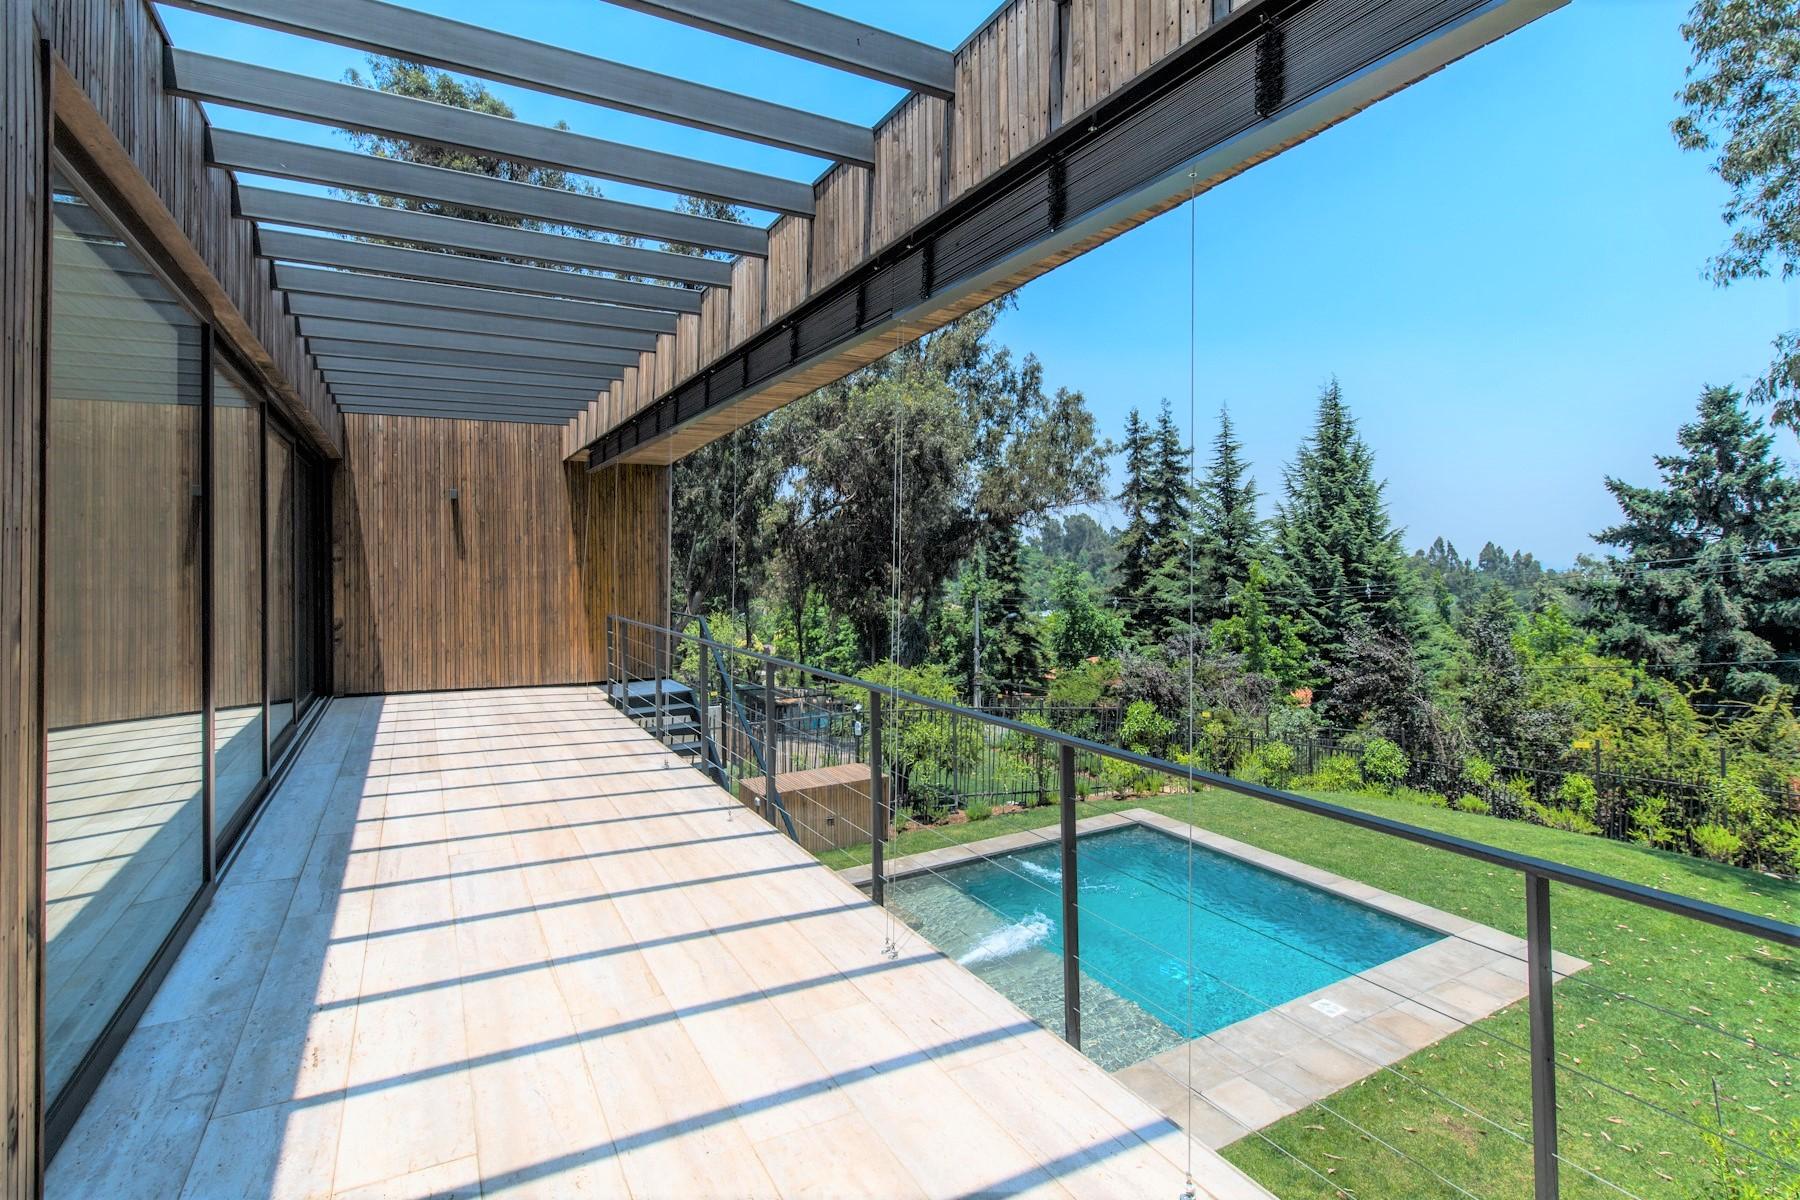 Casa para uma família para Venda às Fabulous contemporary house designed by famous chilean arquitect Mathias Klotz Santiago, Santiago, Chile